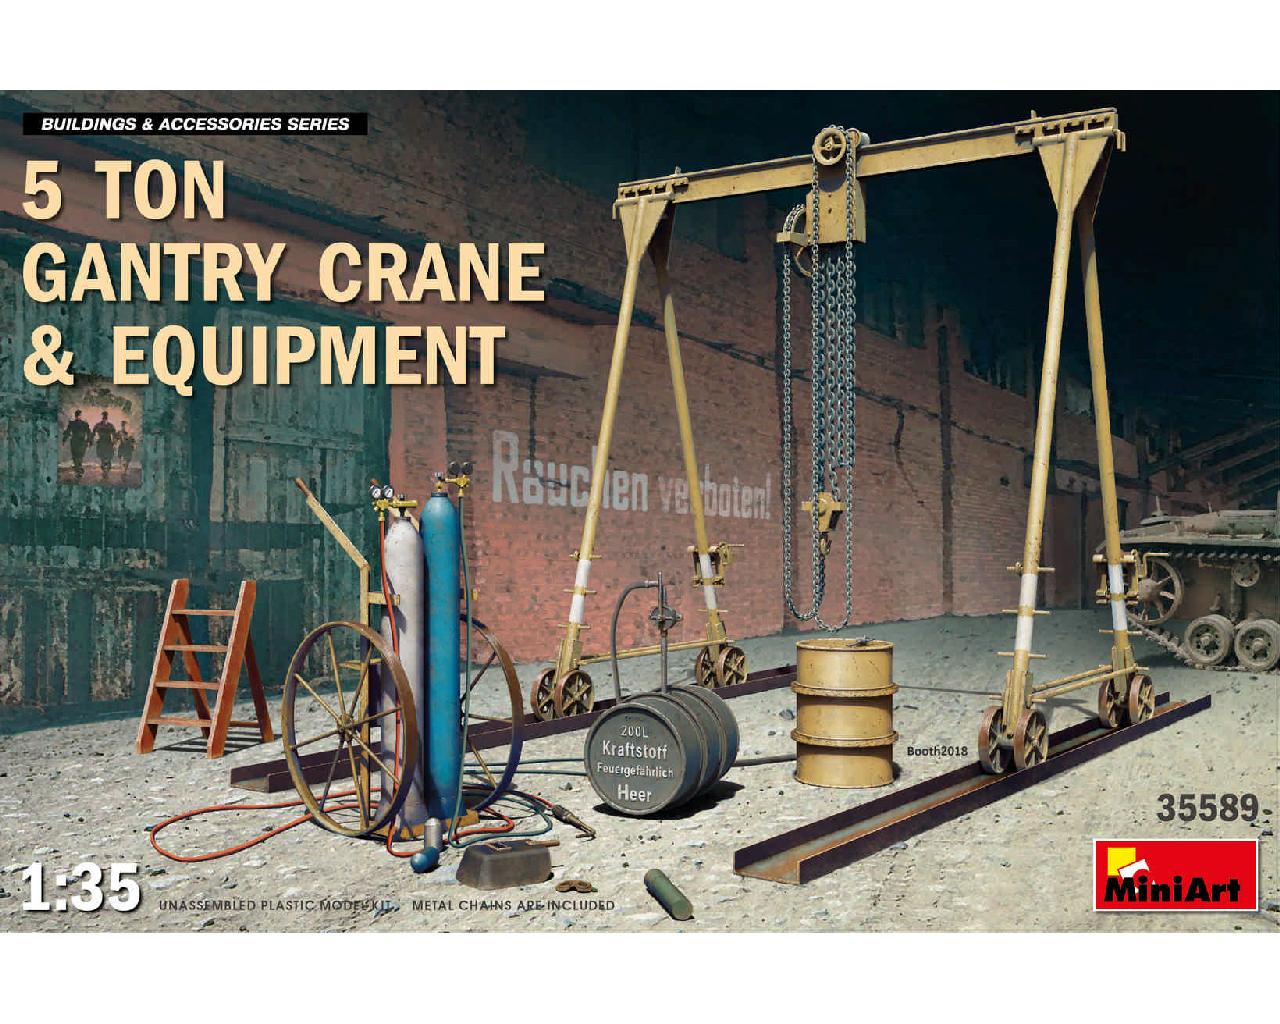 1/35 5 Ton Gantry Crane and Equipment